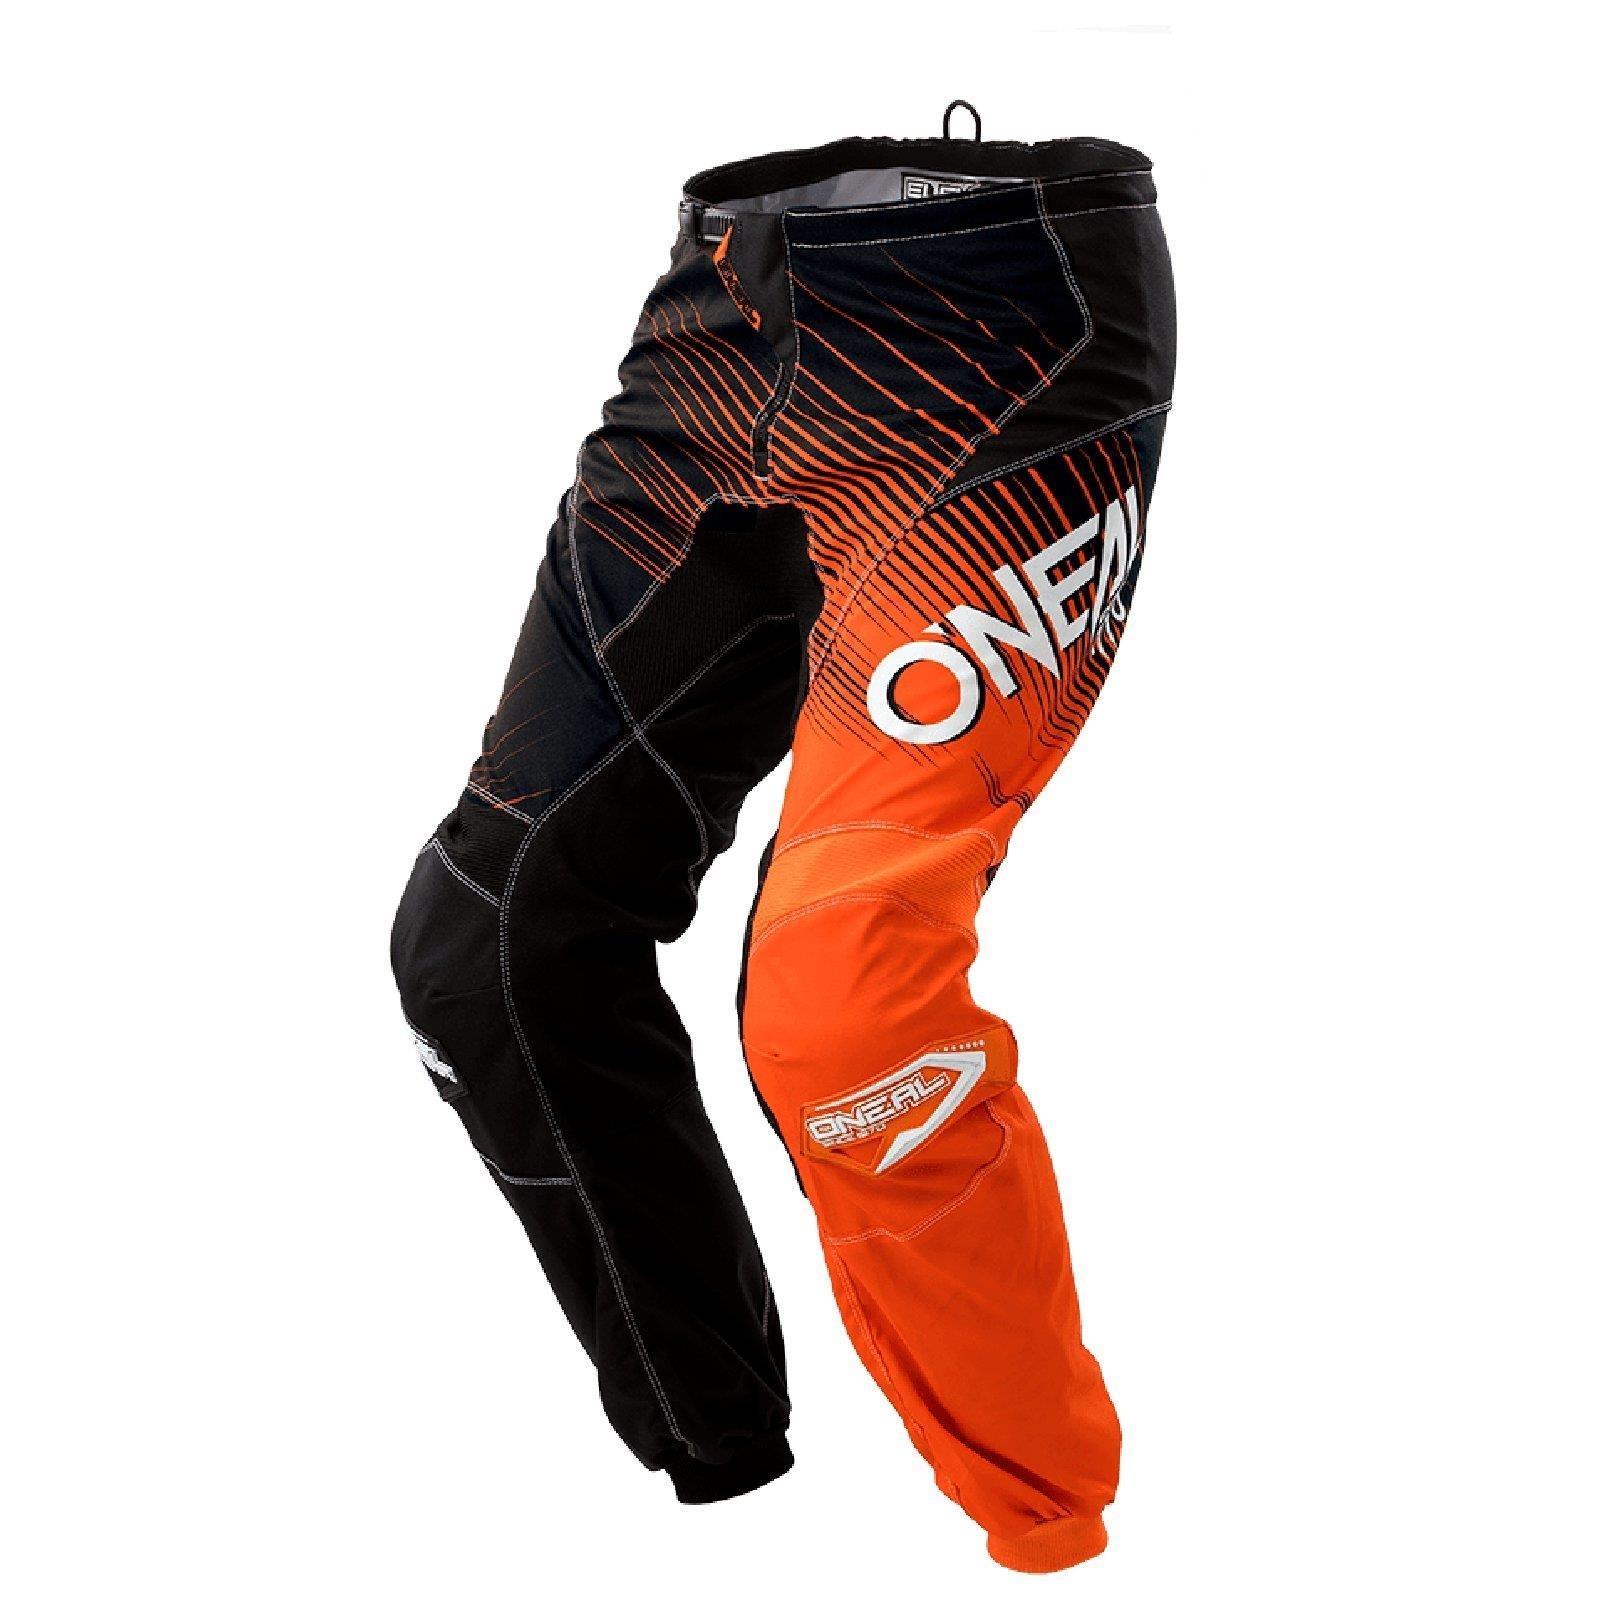 Elemento-oNeal-racewear-Jersey-pantalones-a-ninos-adulto-Motocross-Enduro-downhill miniatura 13